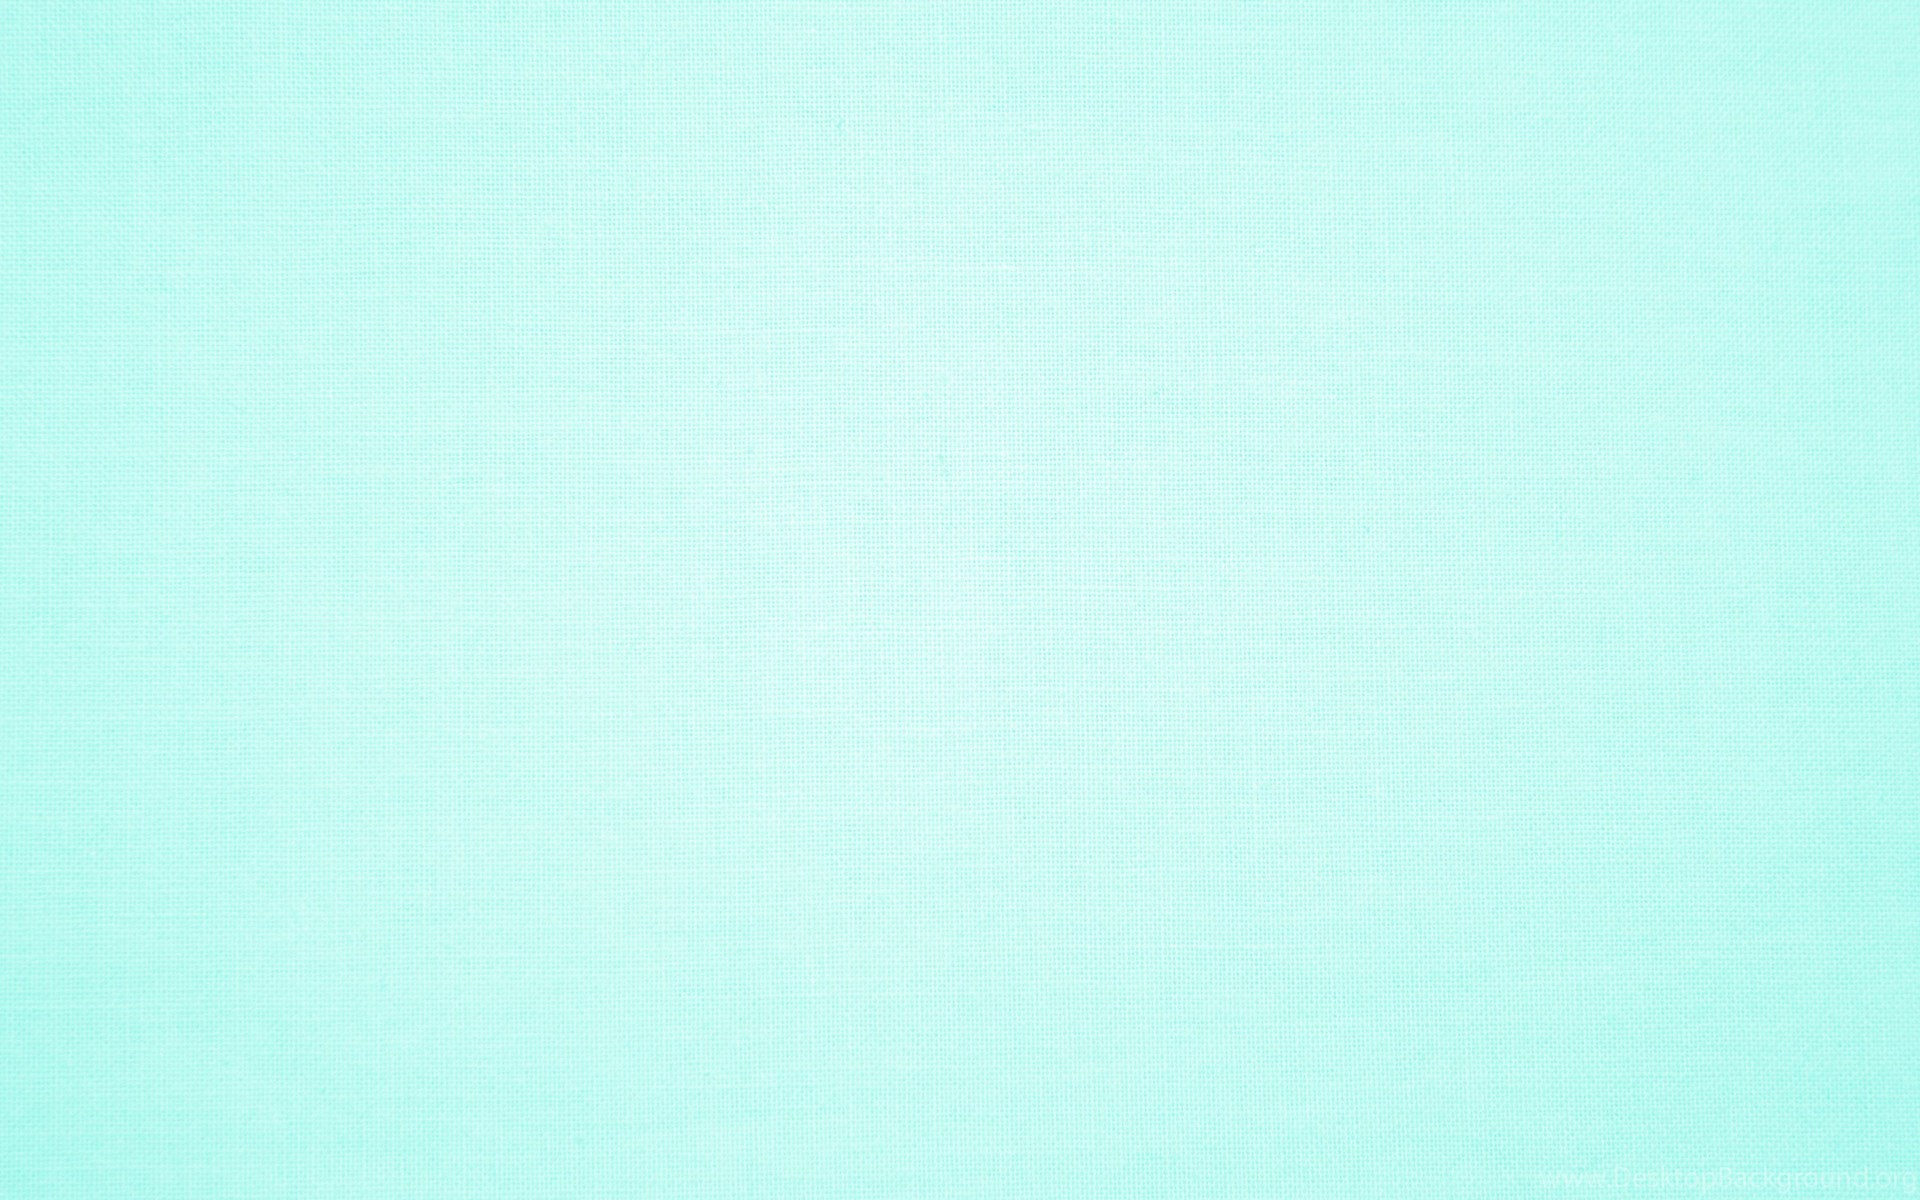 Light Blue Aesthetic Pastel Vintage